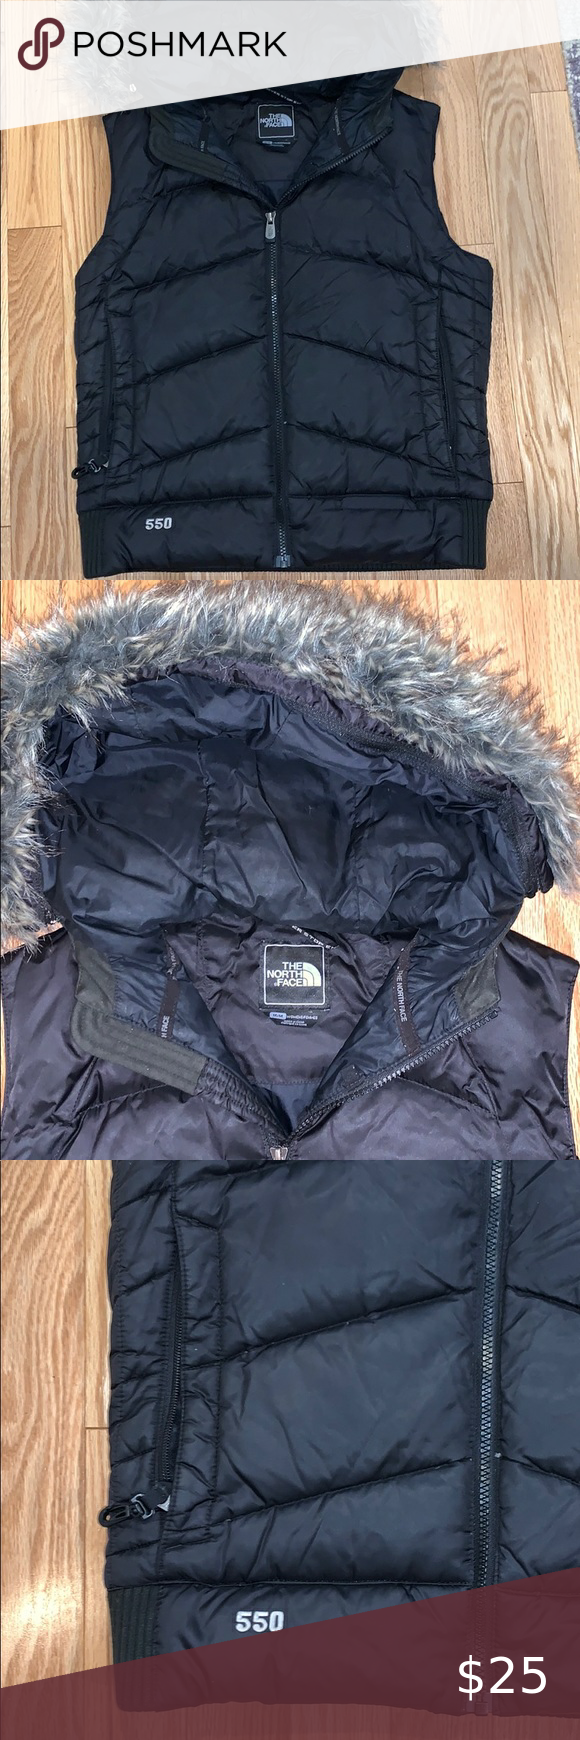 North Face Vest North Face Vest Black North Face Black North Face Vest [ 1740 x 580 Pixel ]